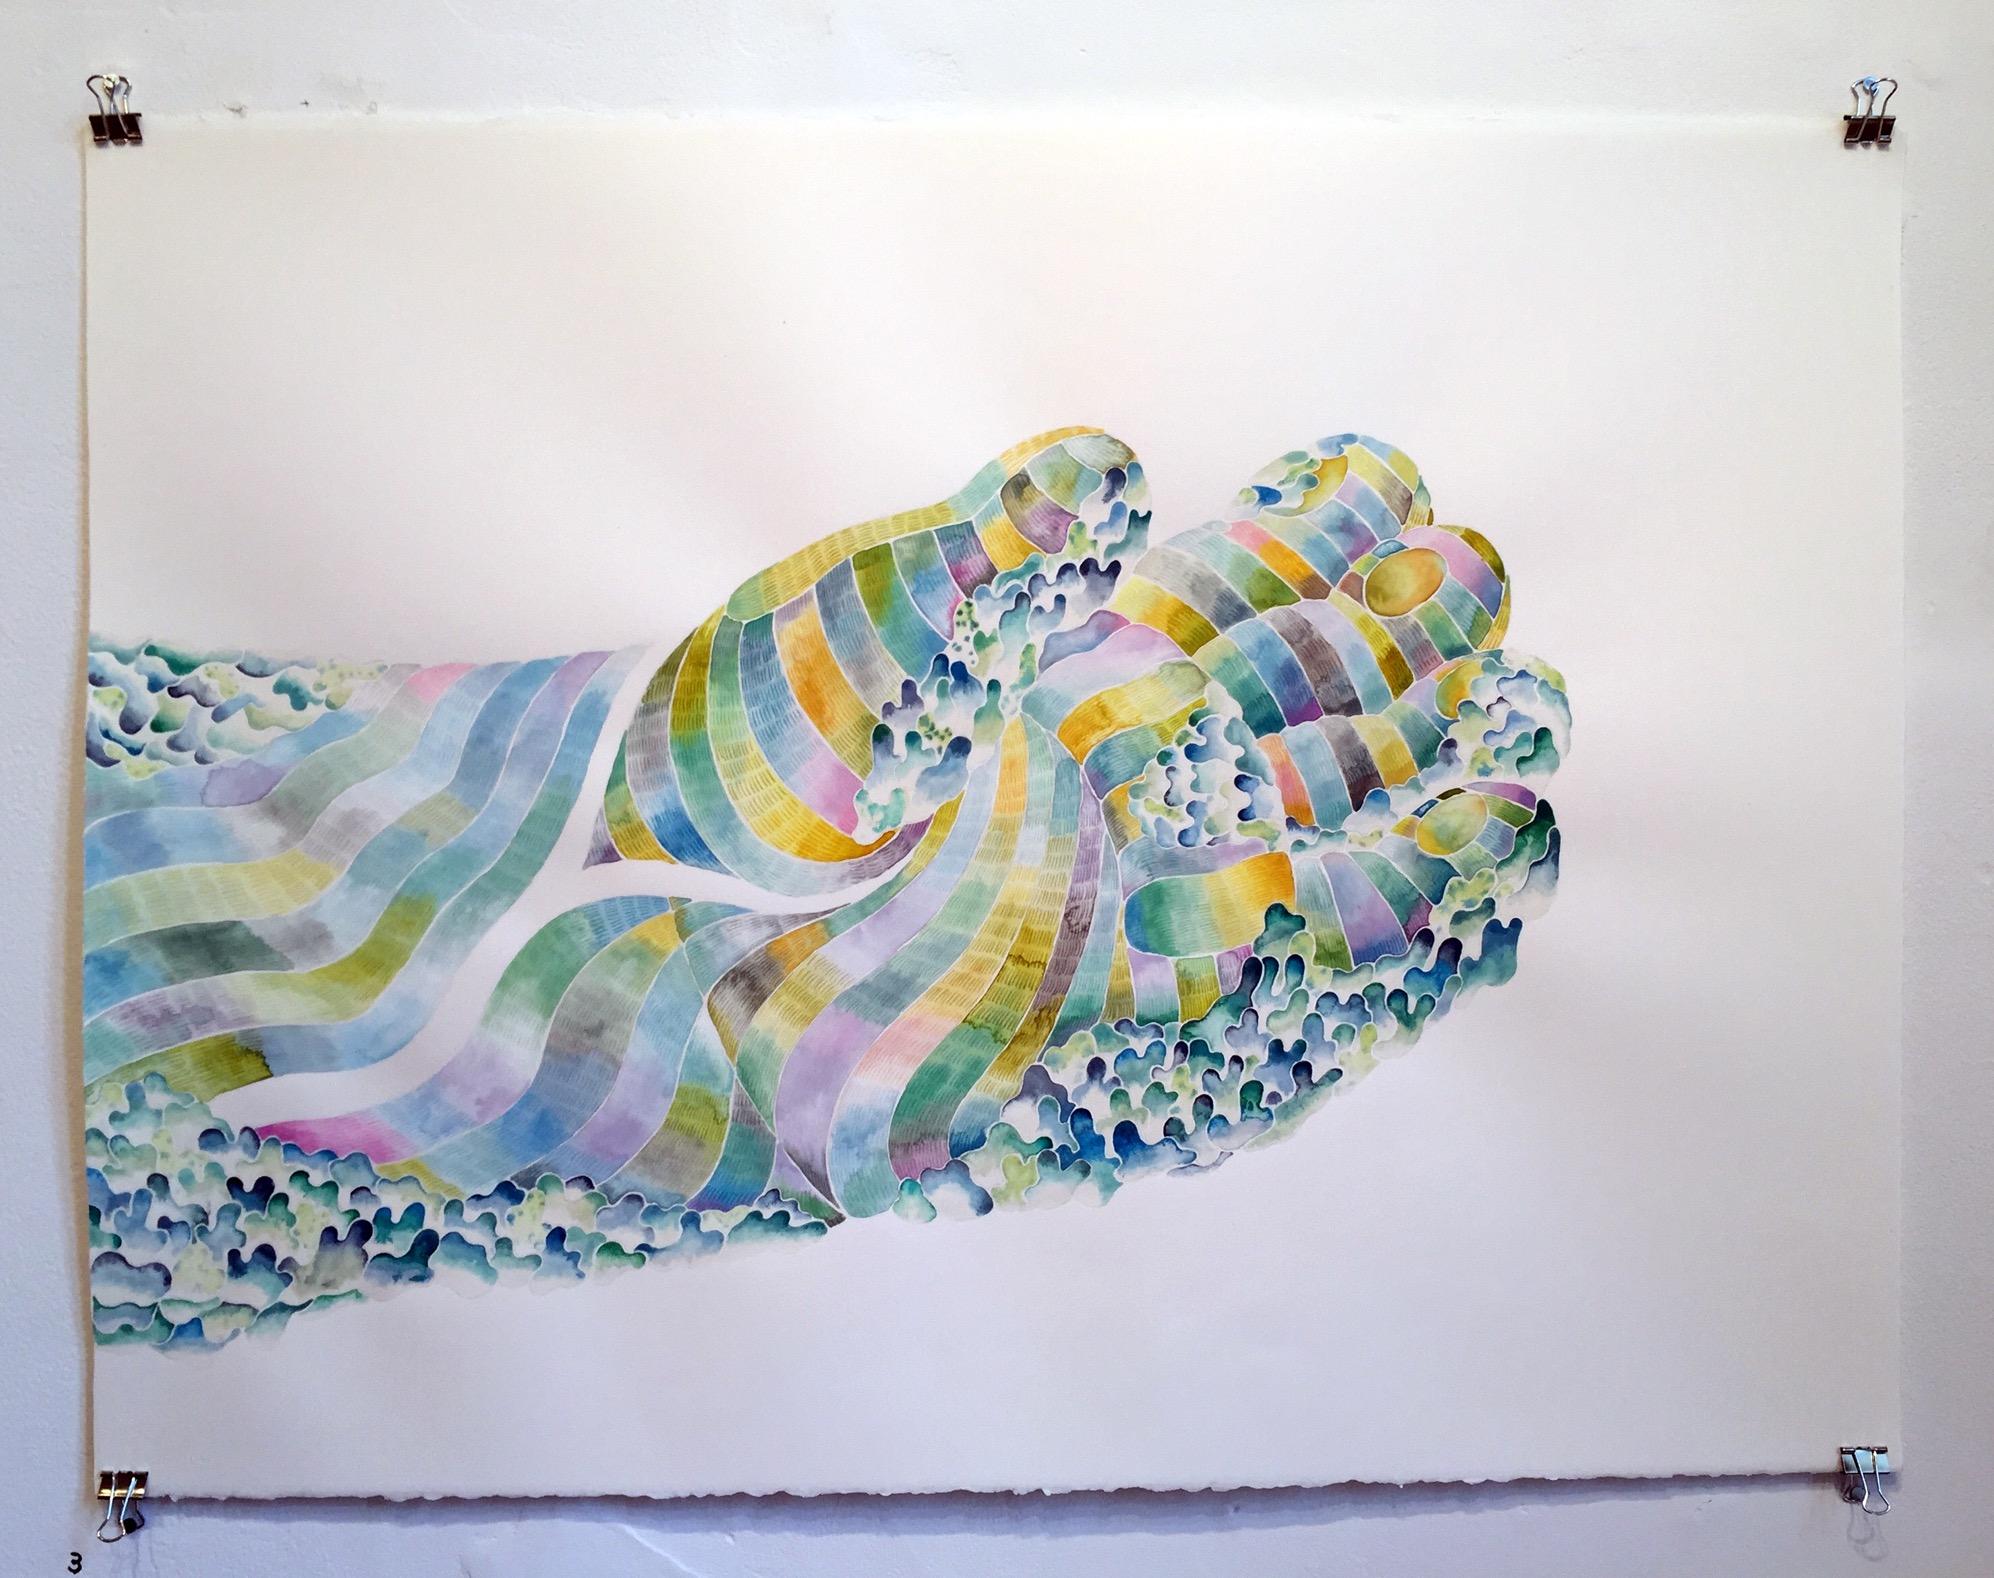 Massive Hand (receptive)